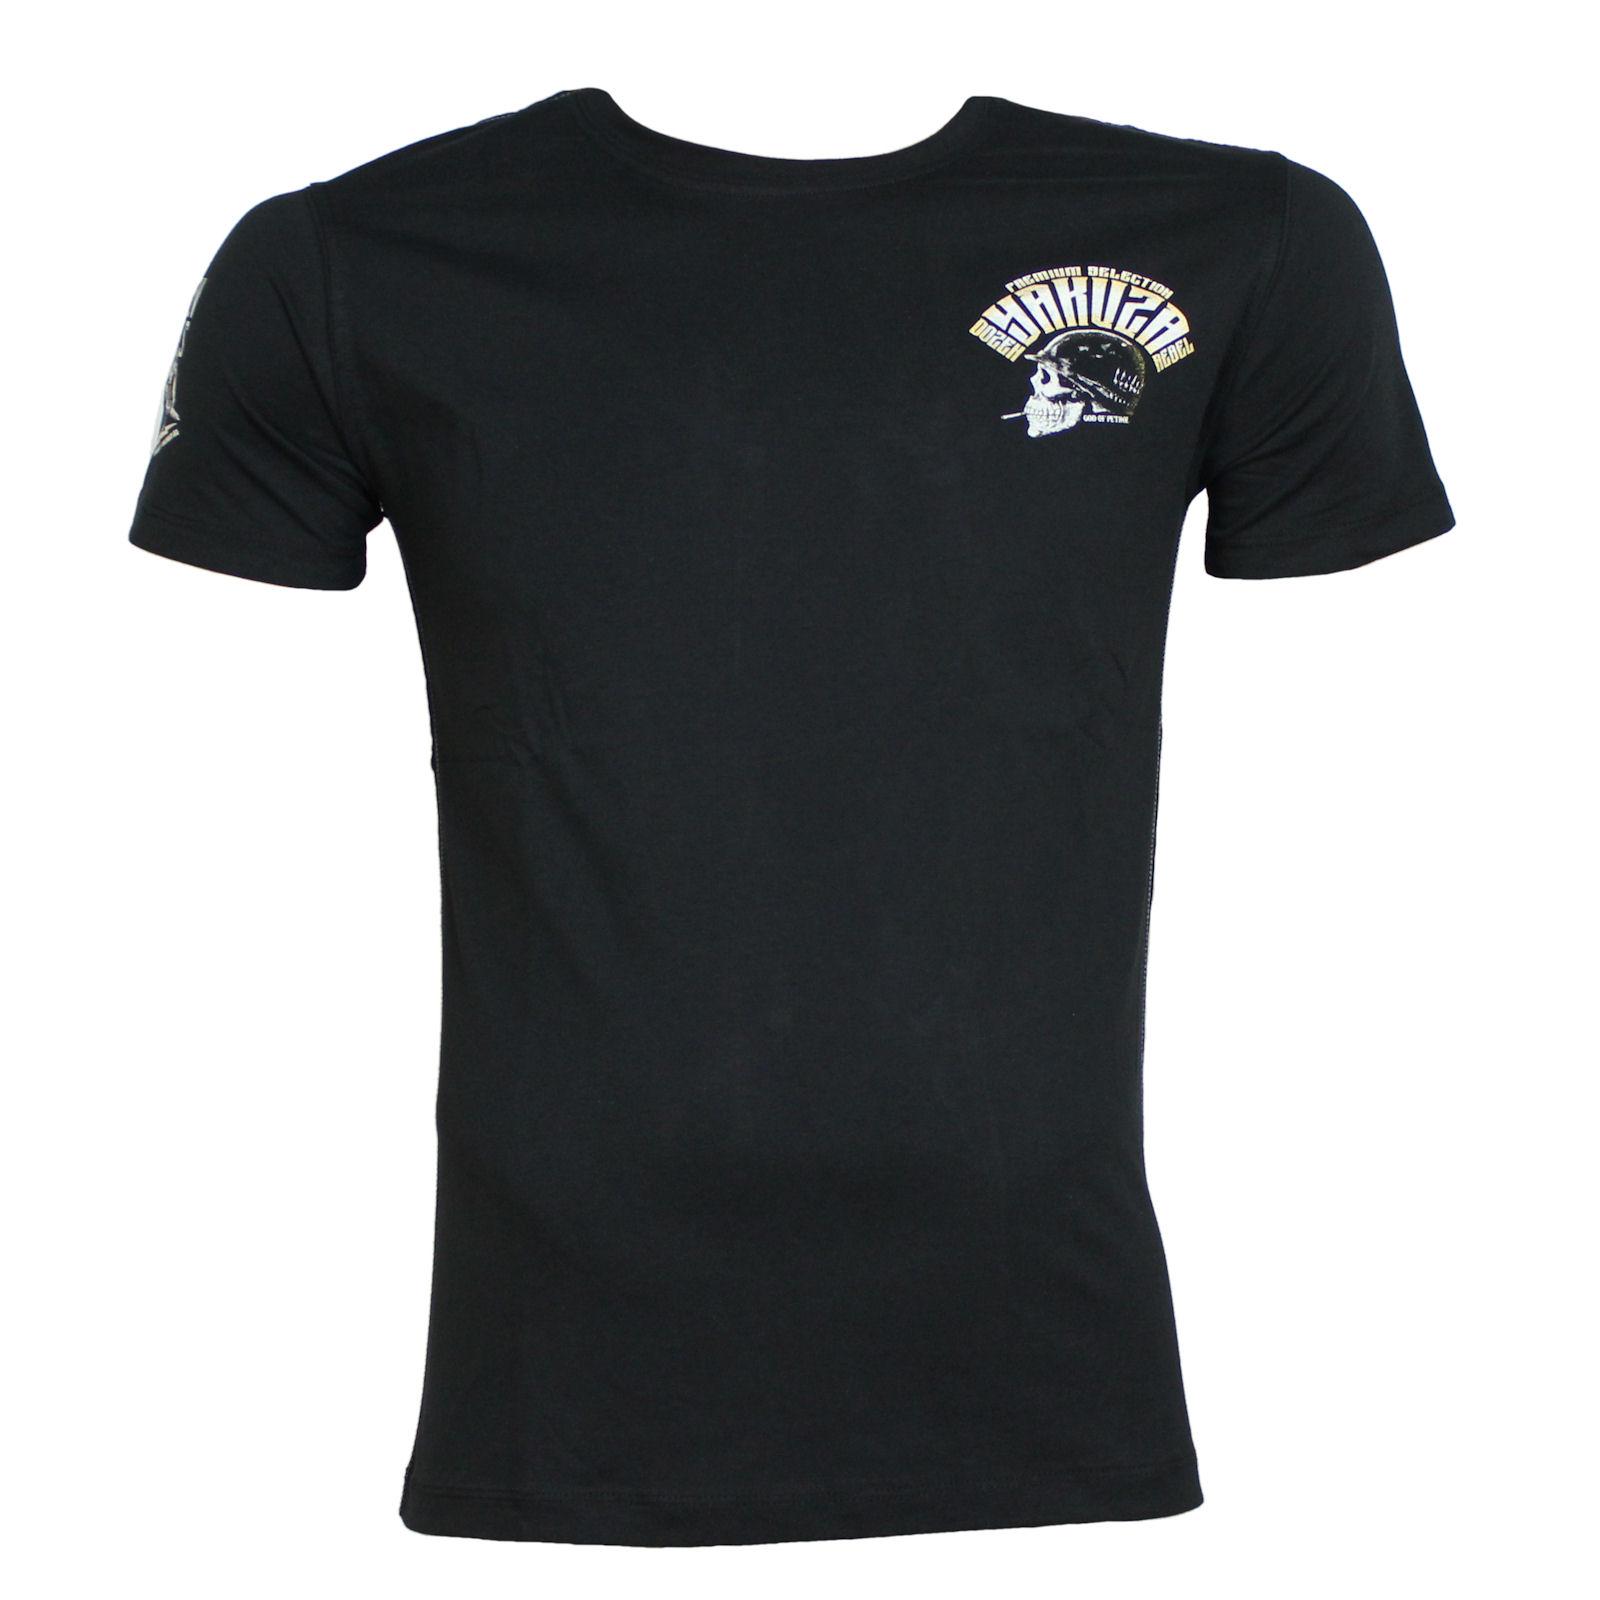 yakuza premium t shirt yps 2414 schwarz specials herren t. Black Bedroom Furniture Sets. Home Design Ideas